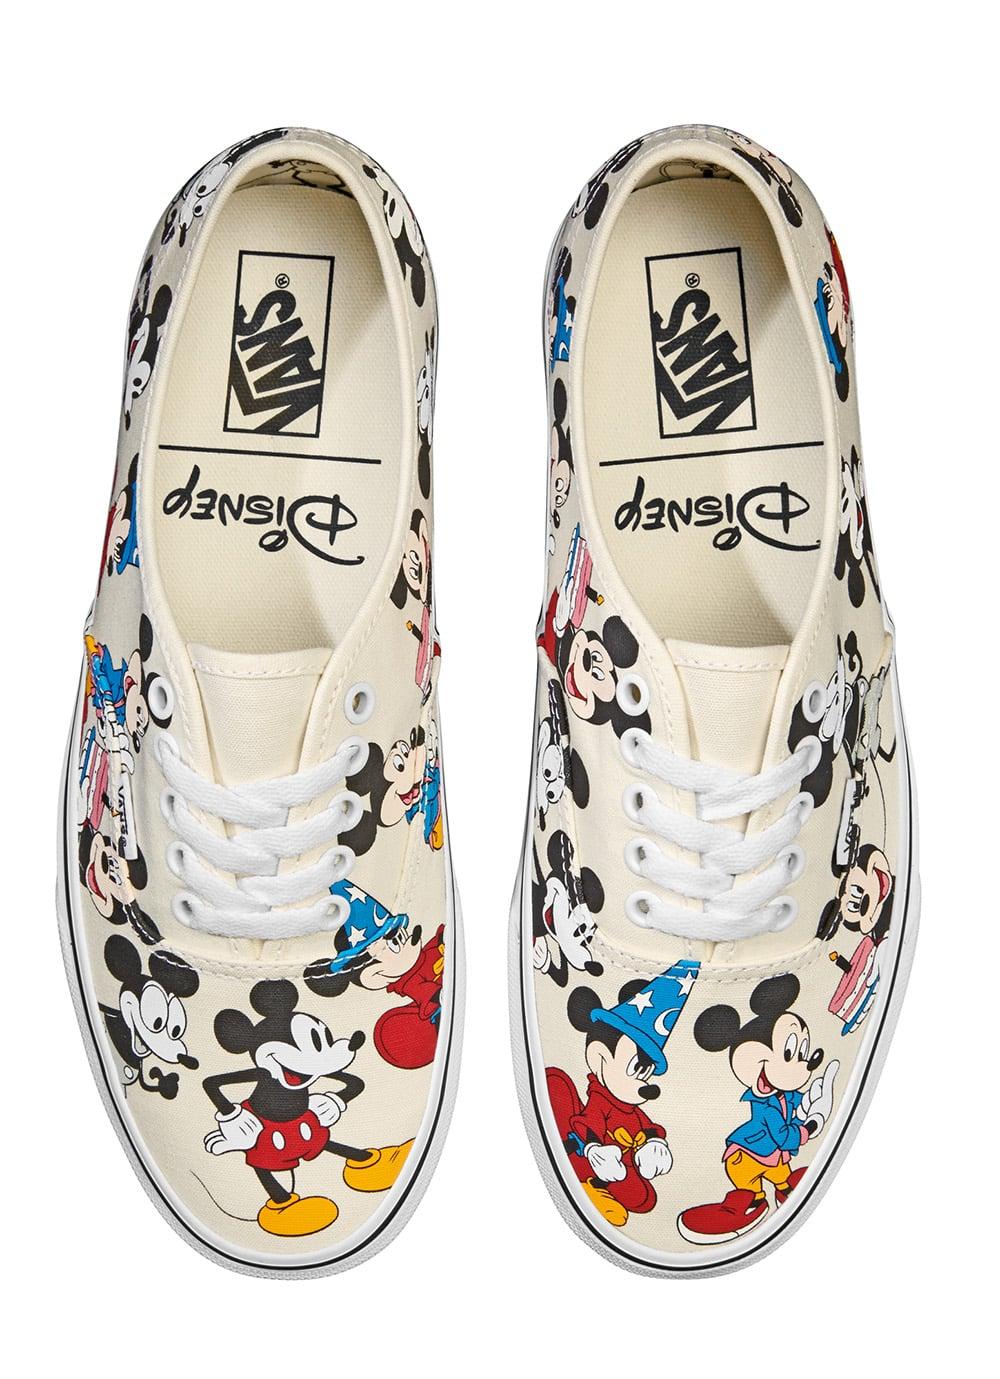 Vans x Disney Collection 2018   POPSUGAR Fashion